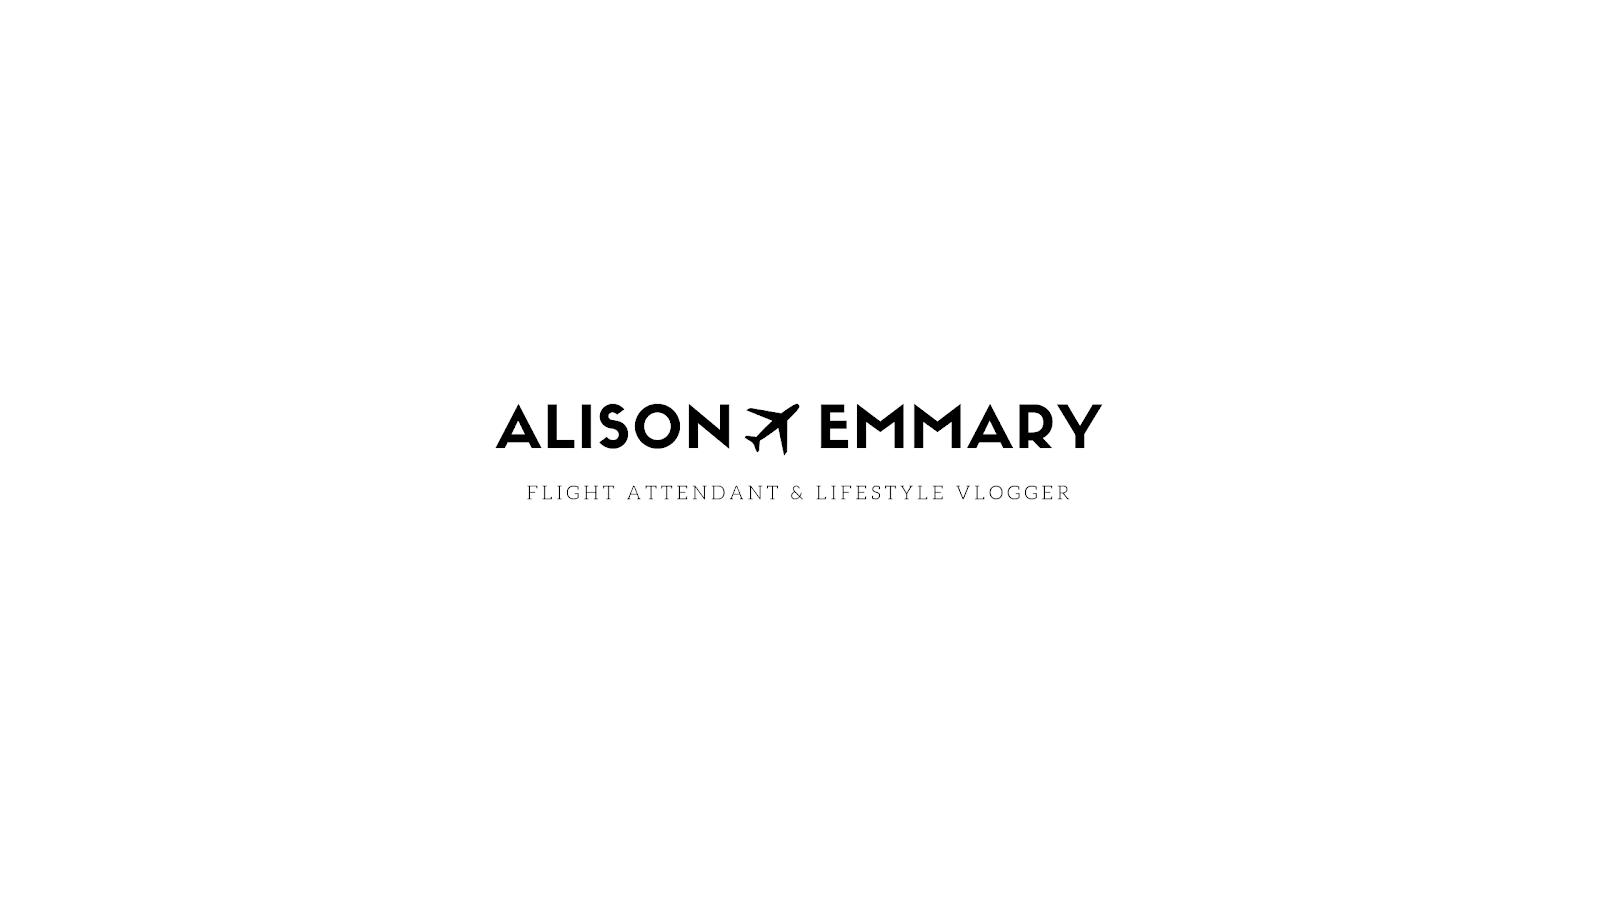 Alison Emmary